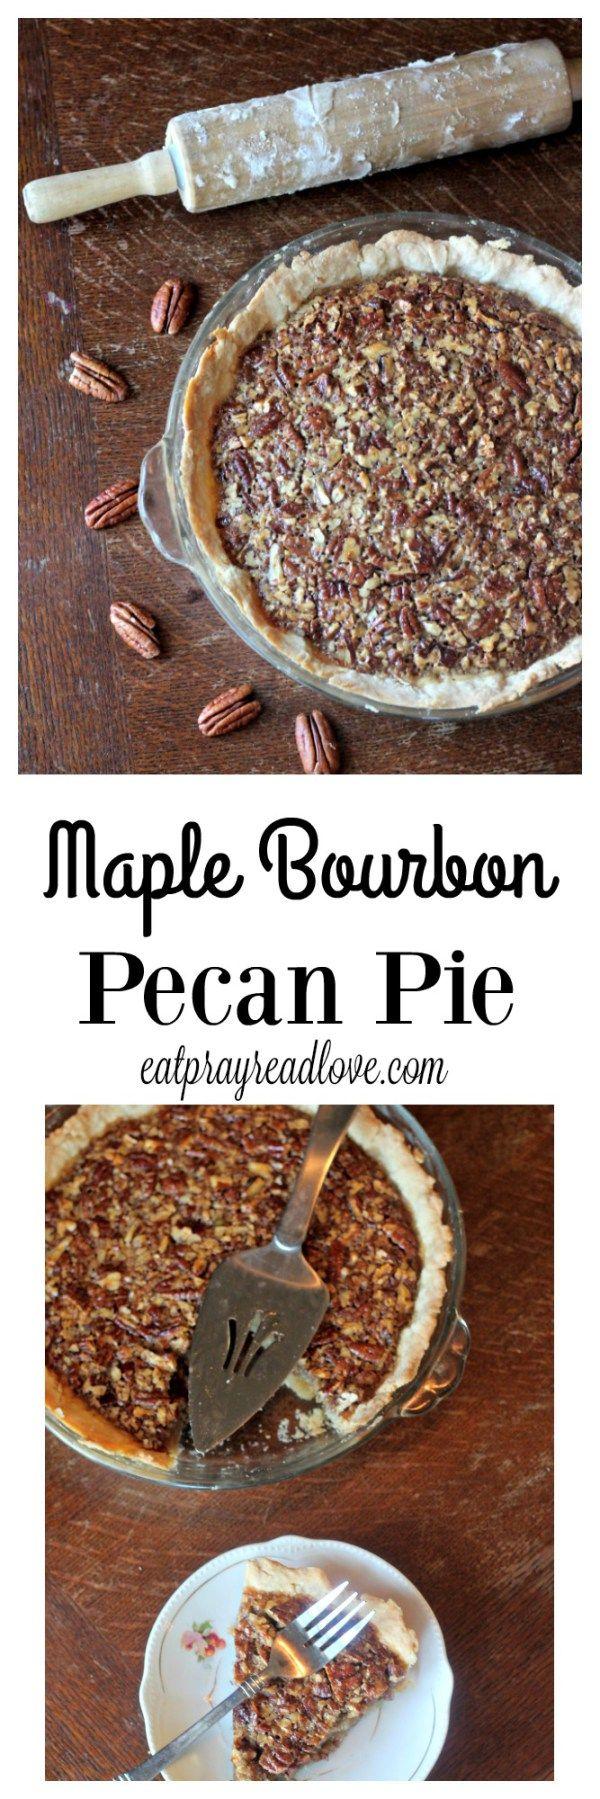 Maple Bourbon Pecan Pie- so delicious!